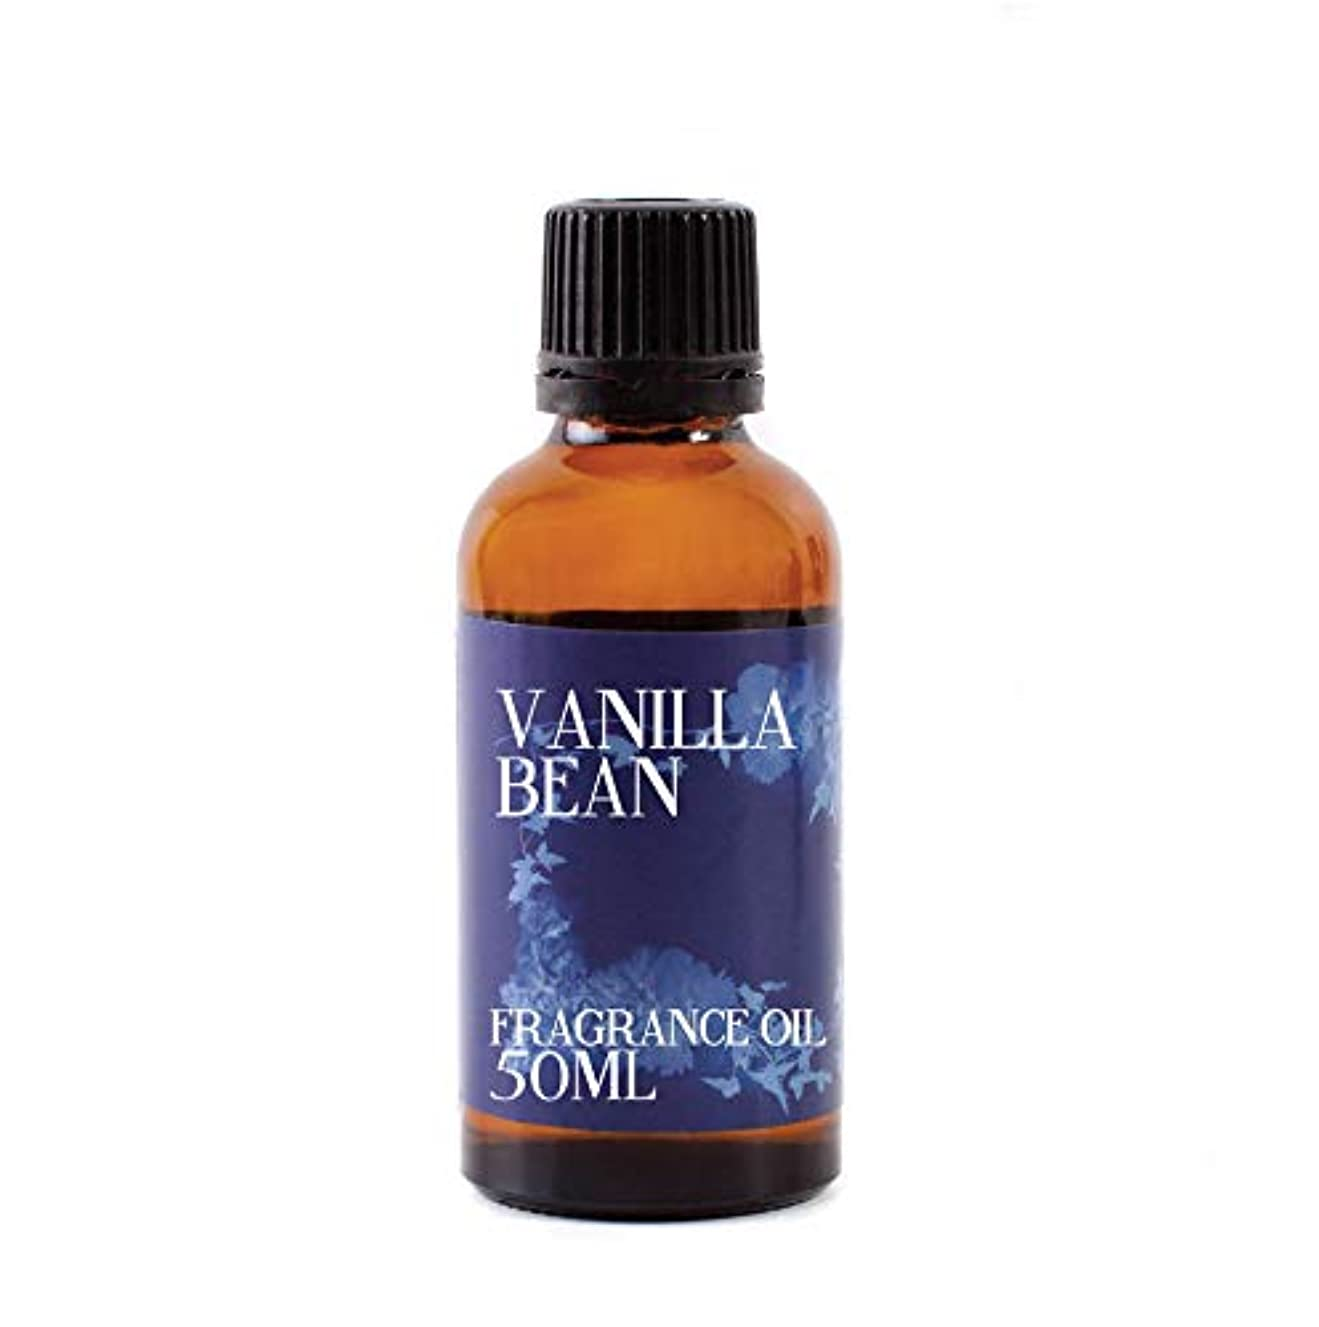 Mystic Moments | Vanilla Bean Fragrance Oil - 50ml